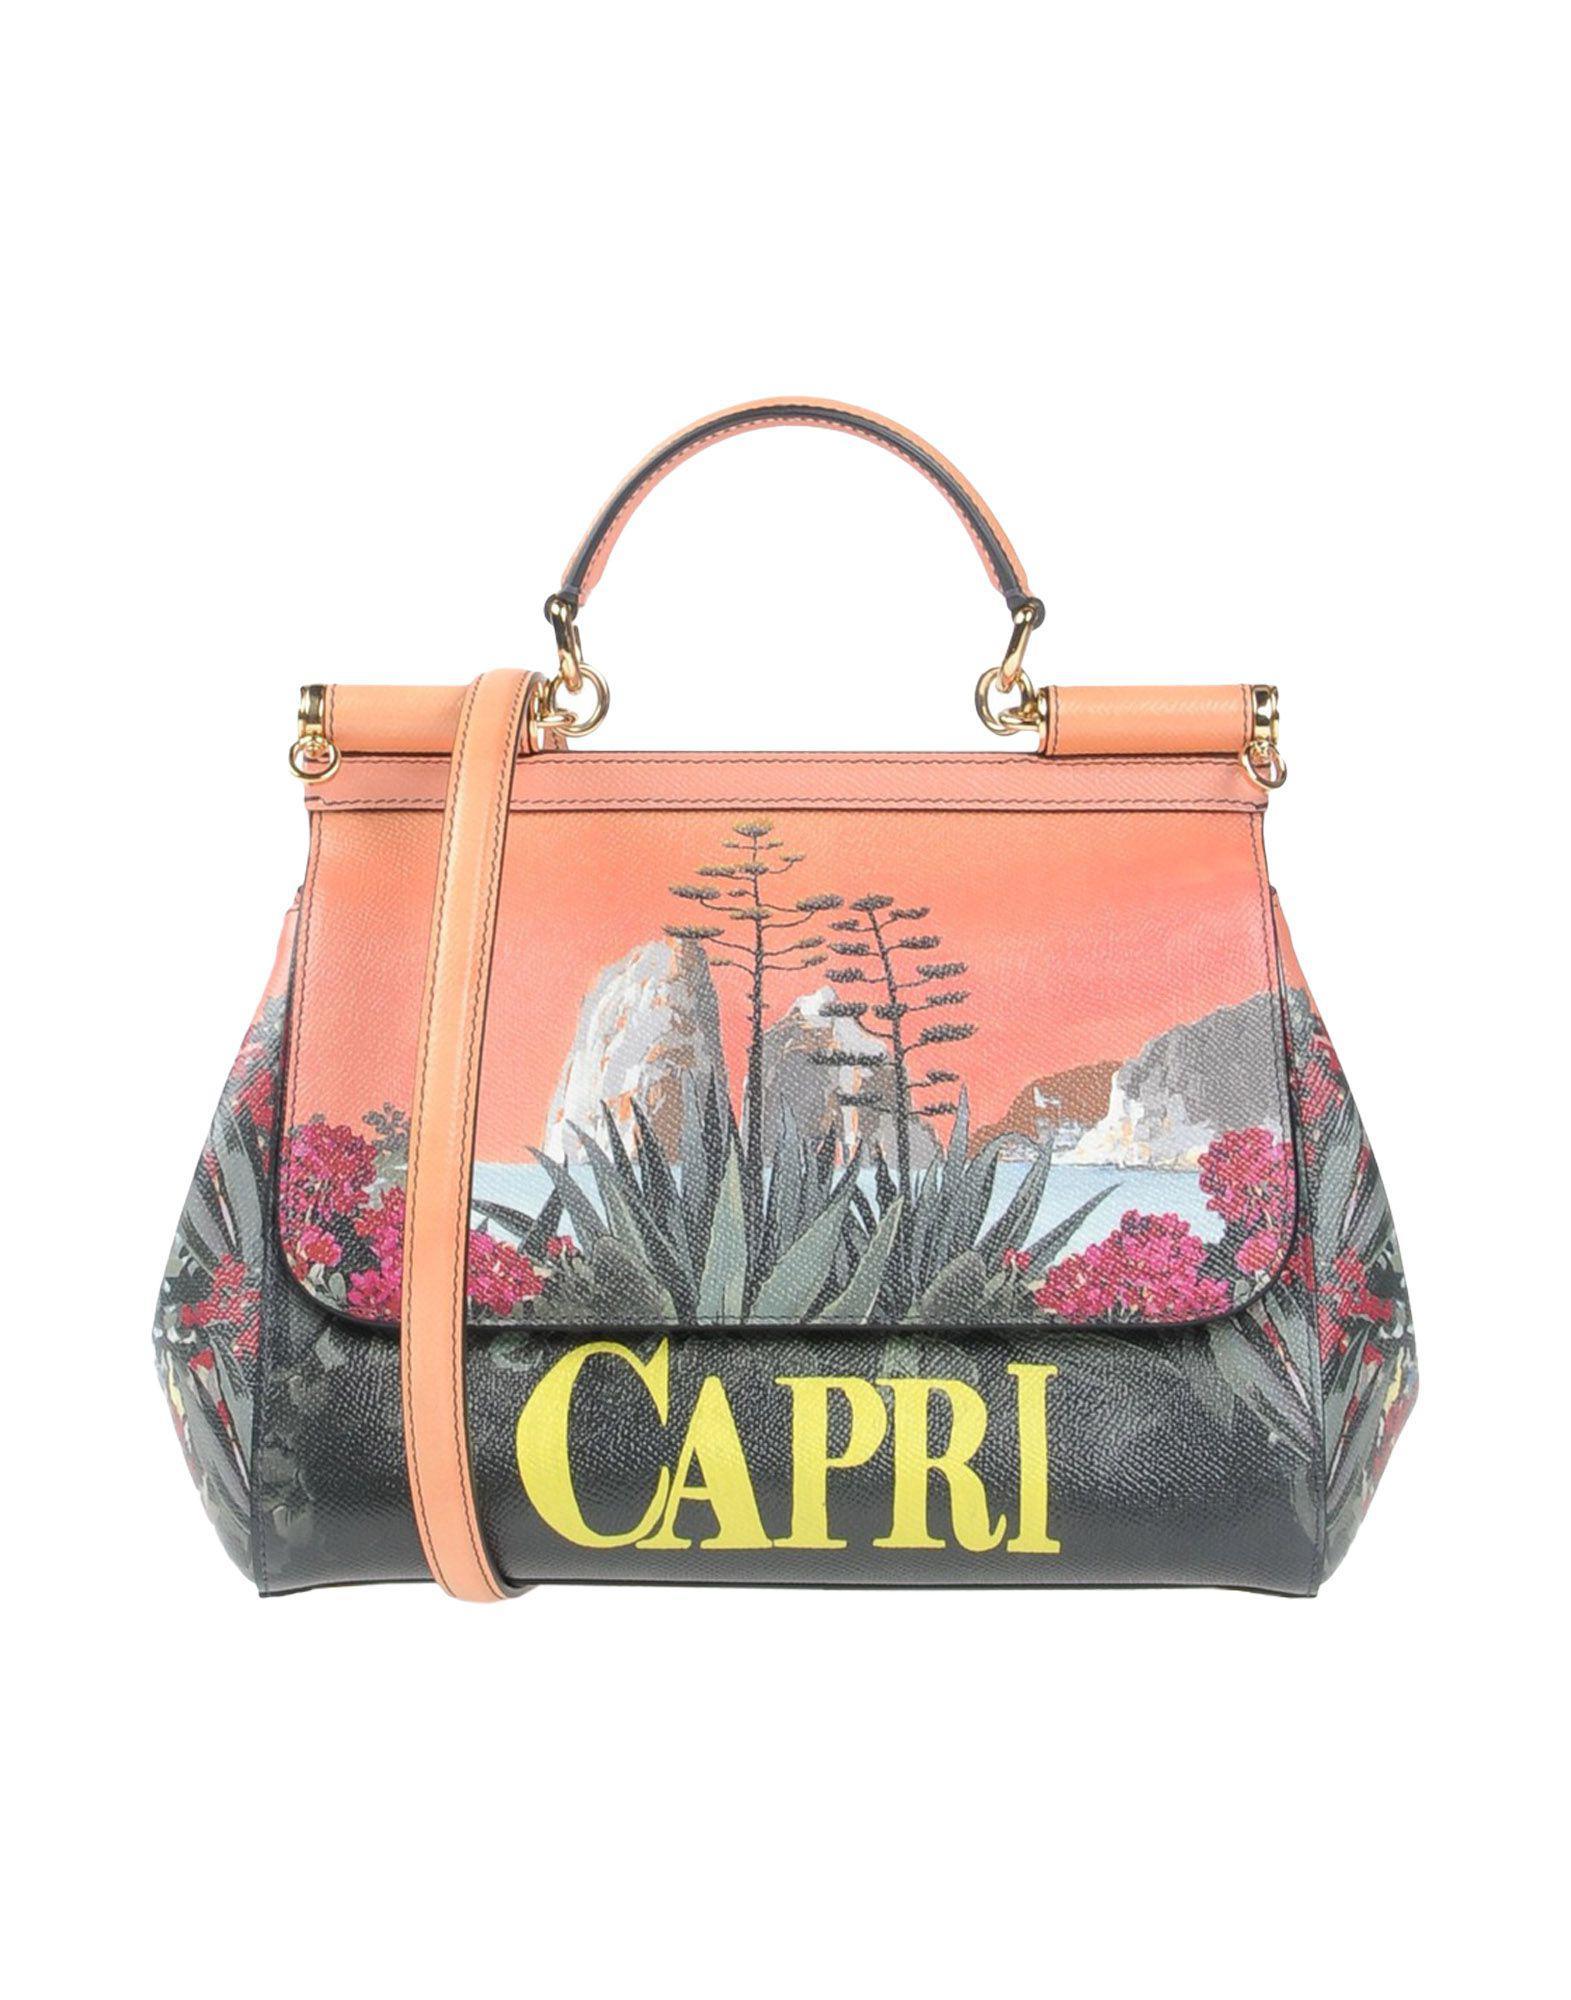 30ce1c38e11e Lyst - Dolce   Gabbana Handbag in Orange